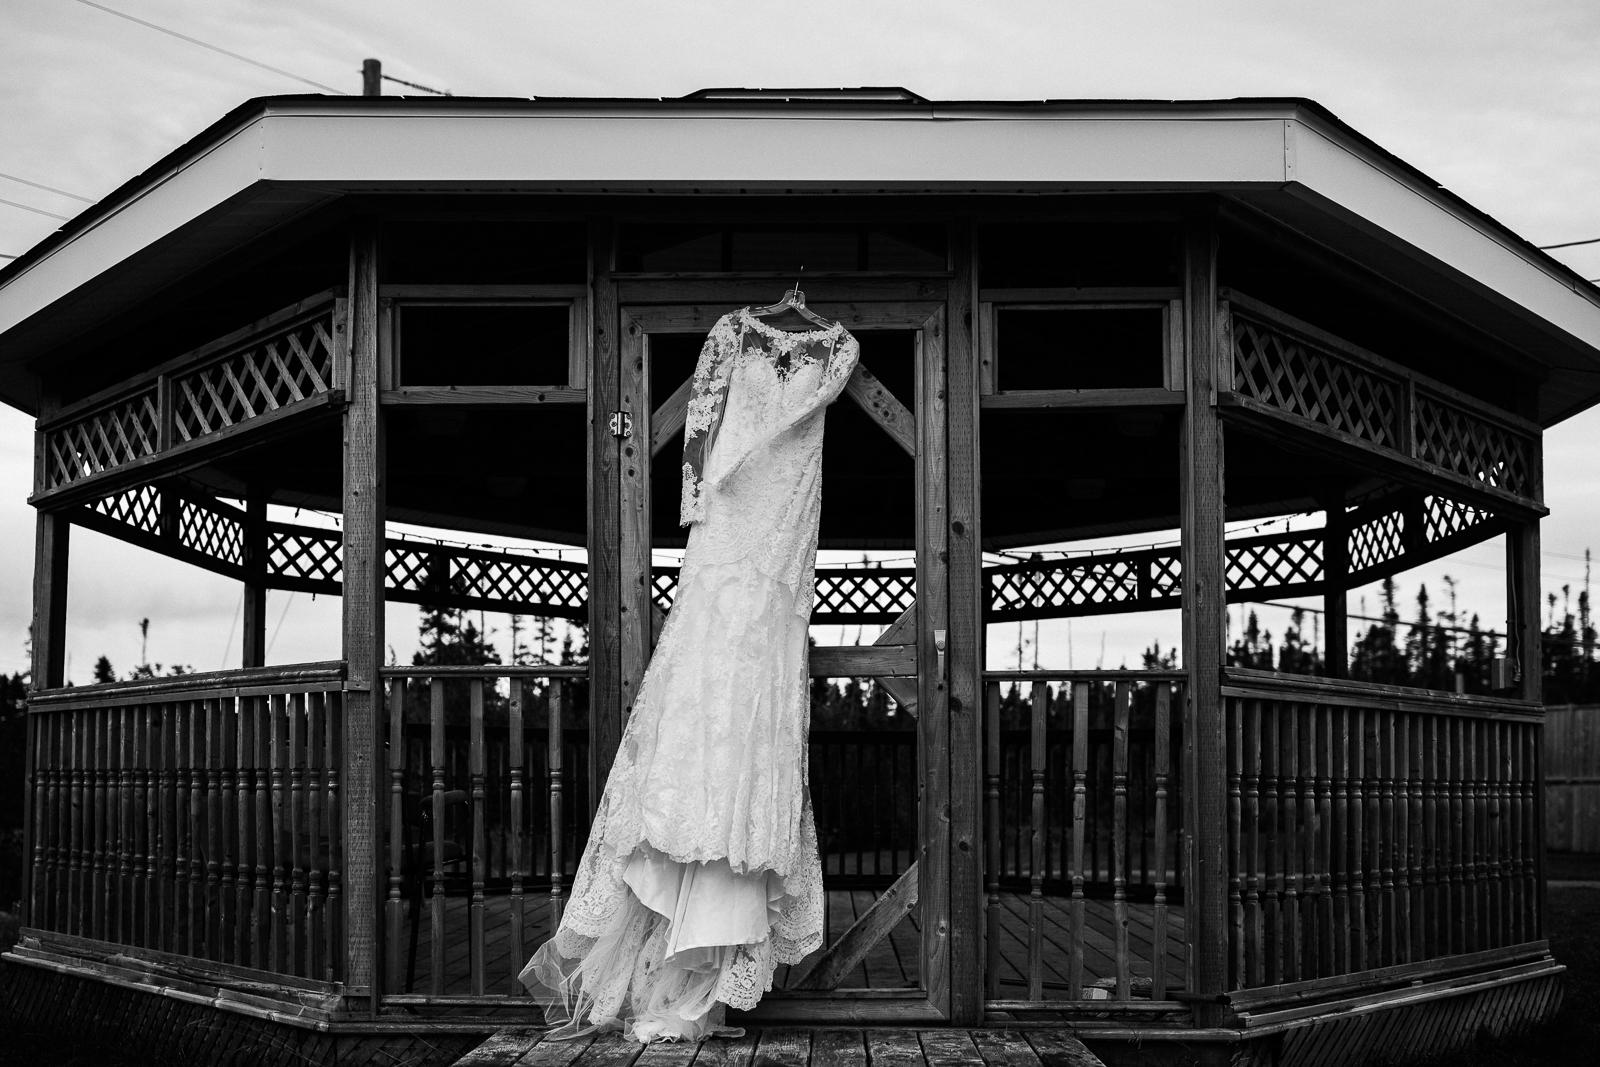 gander-wedding-photographer-16.jpg